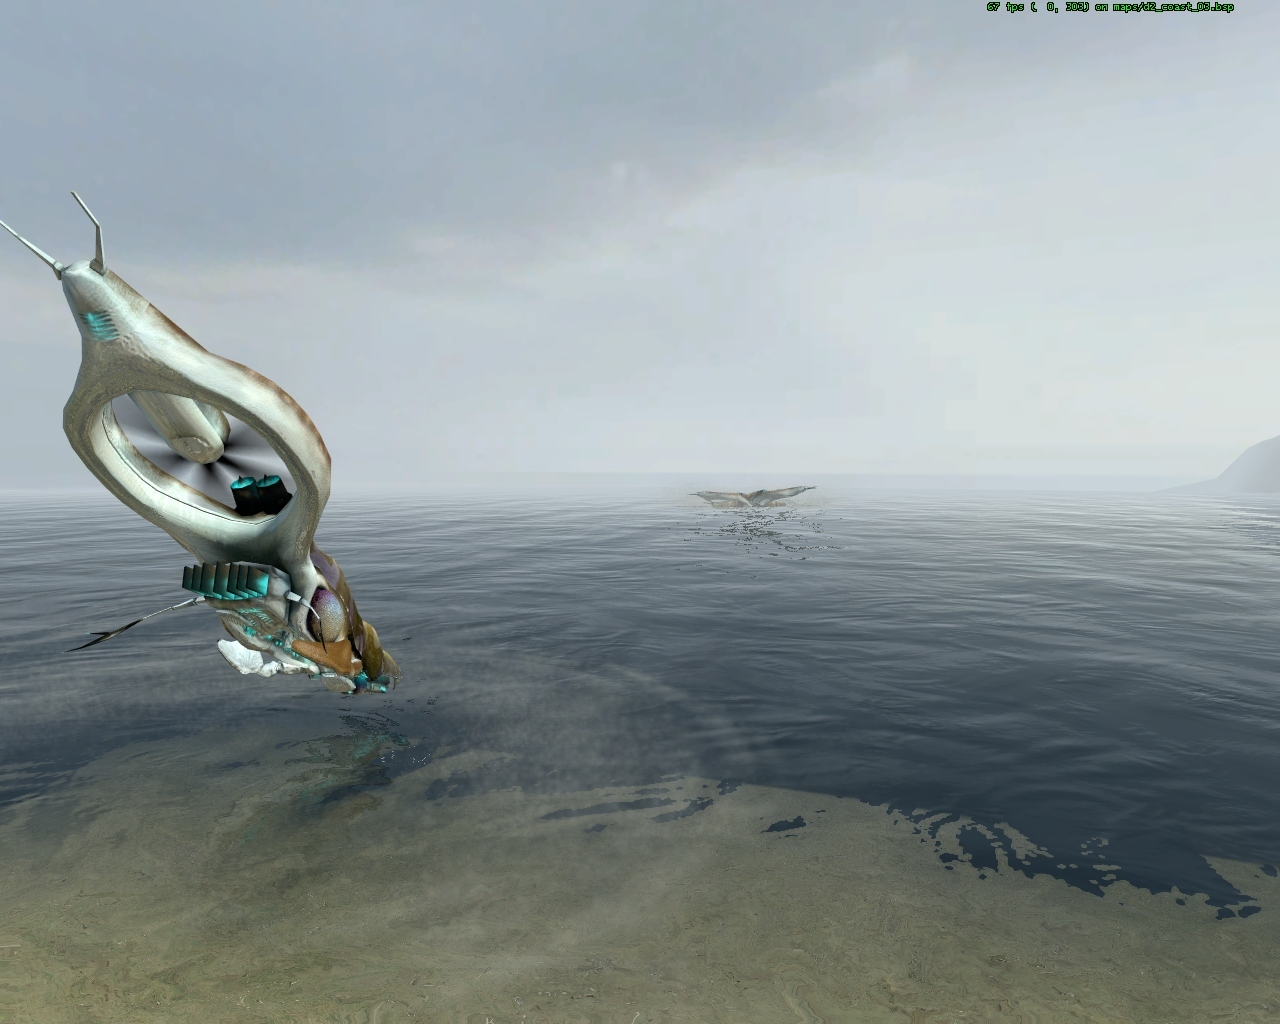 d2_coast_030075.jpg - Half-Life 2